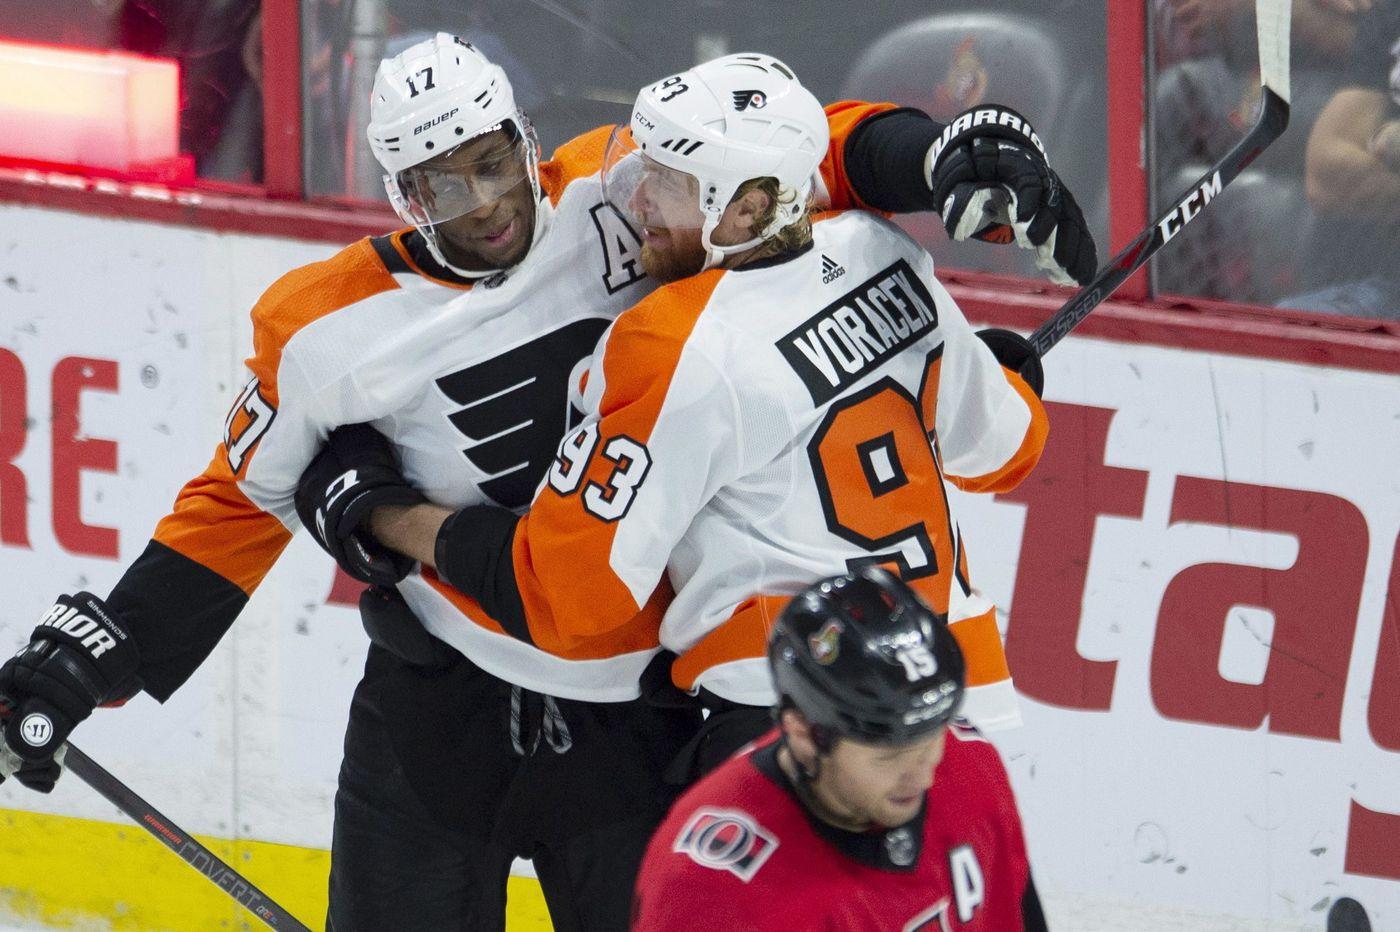 Voracek's 5-point night propels Flyers past Senators